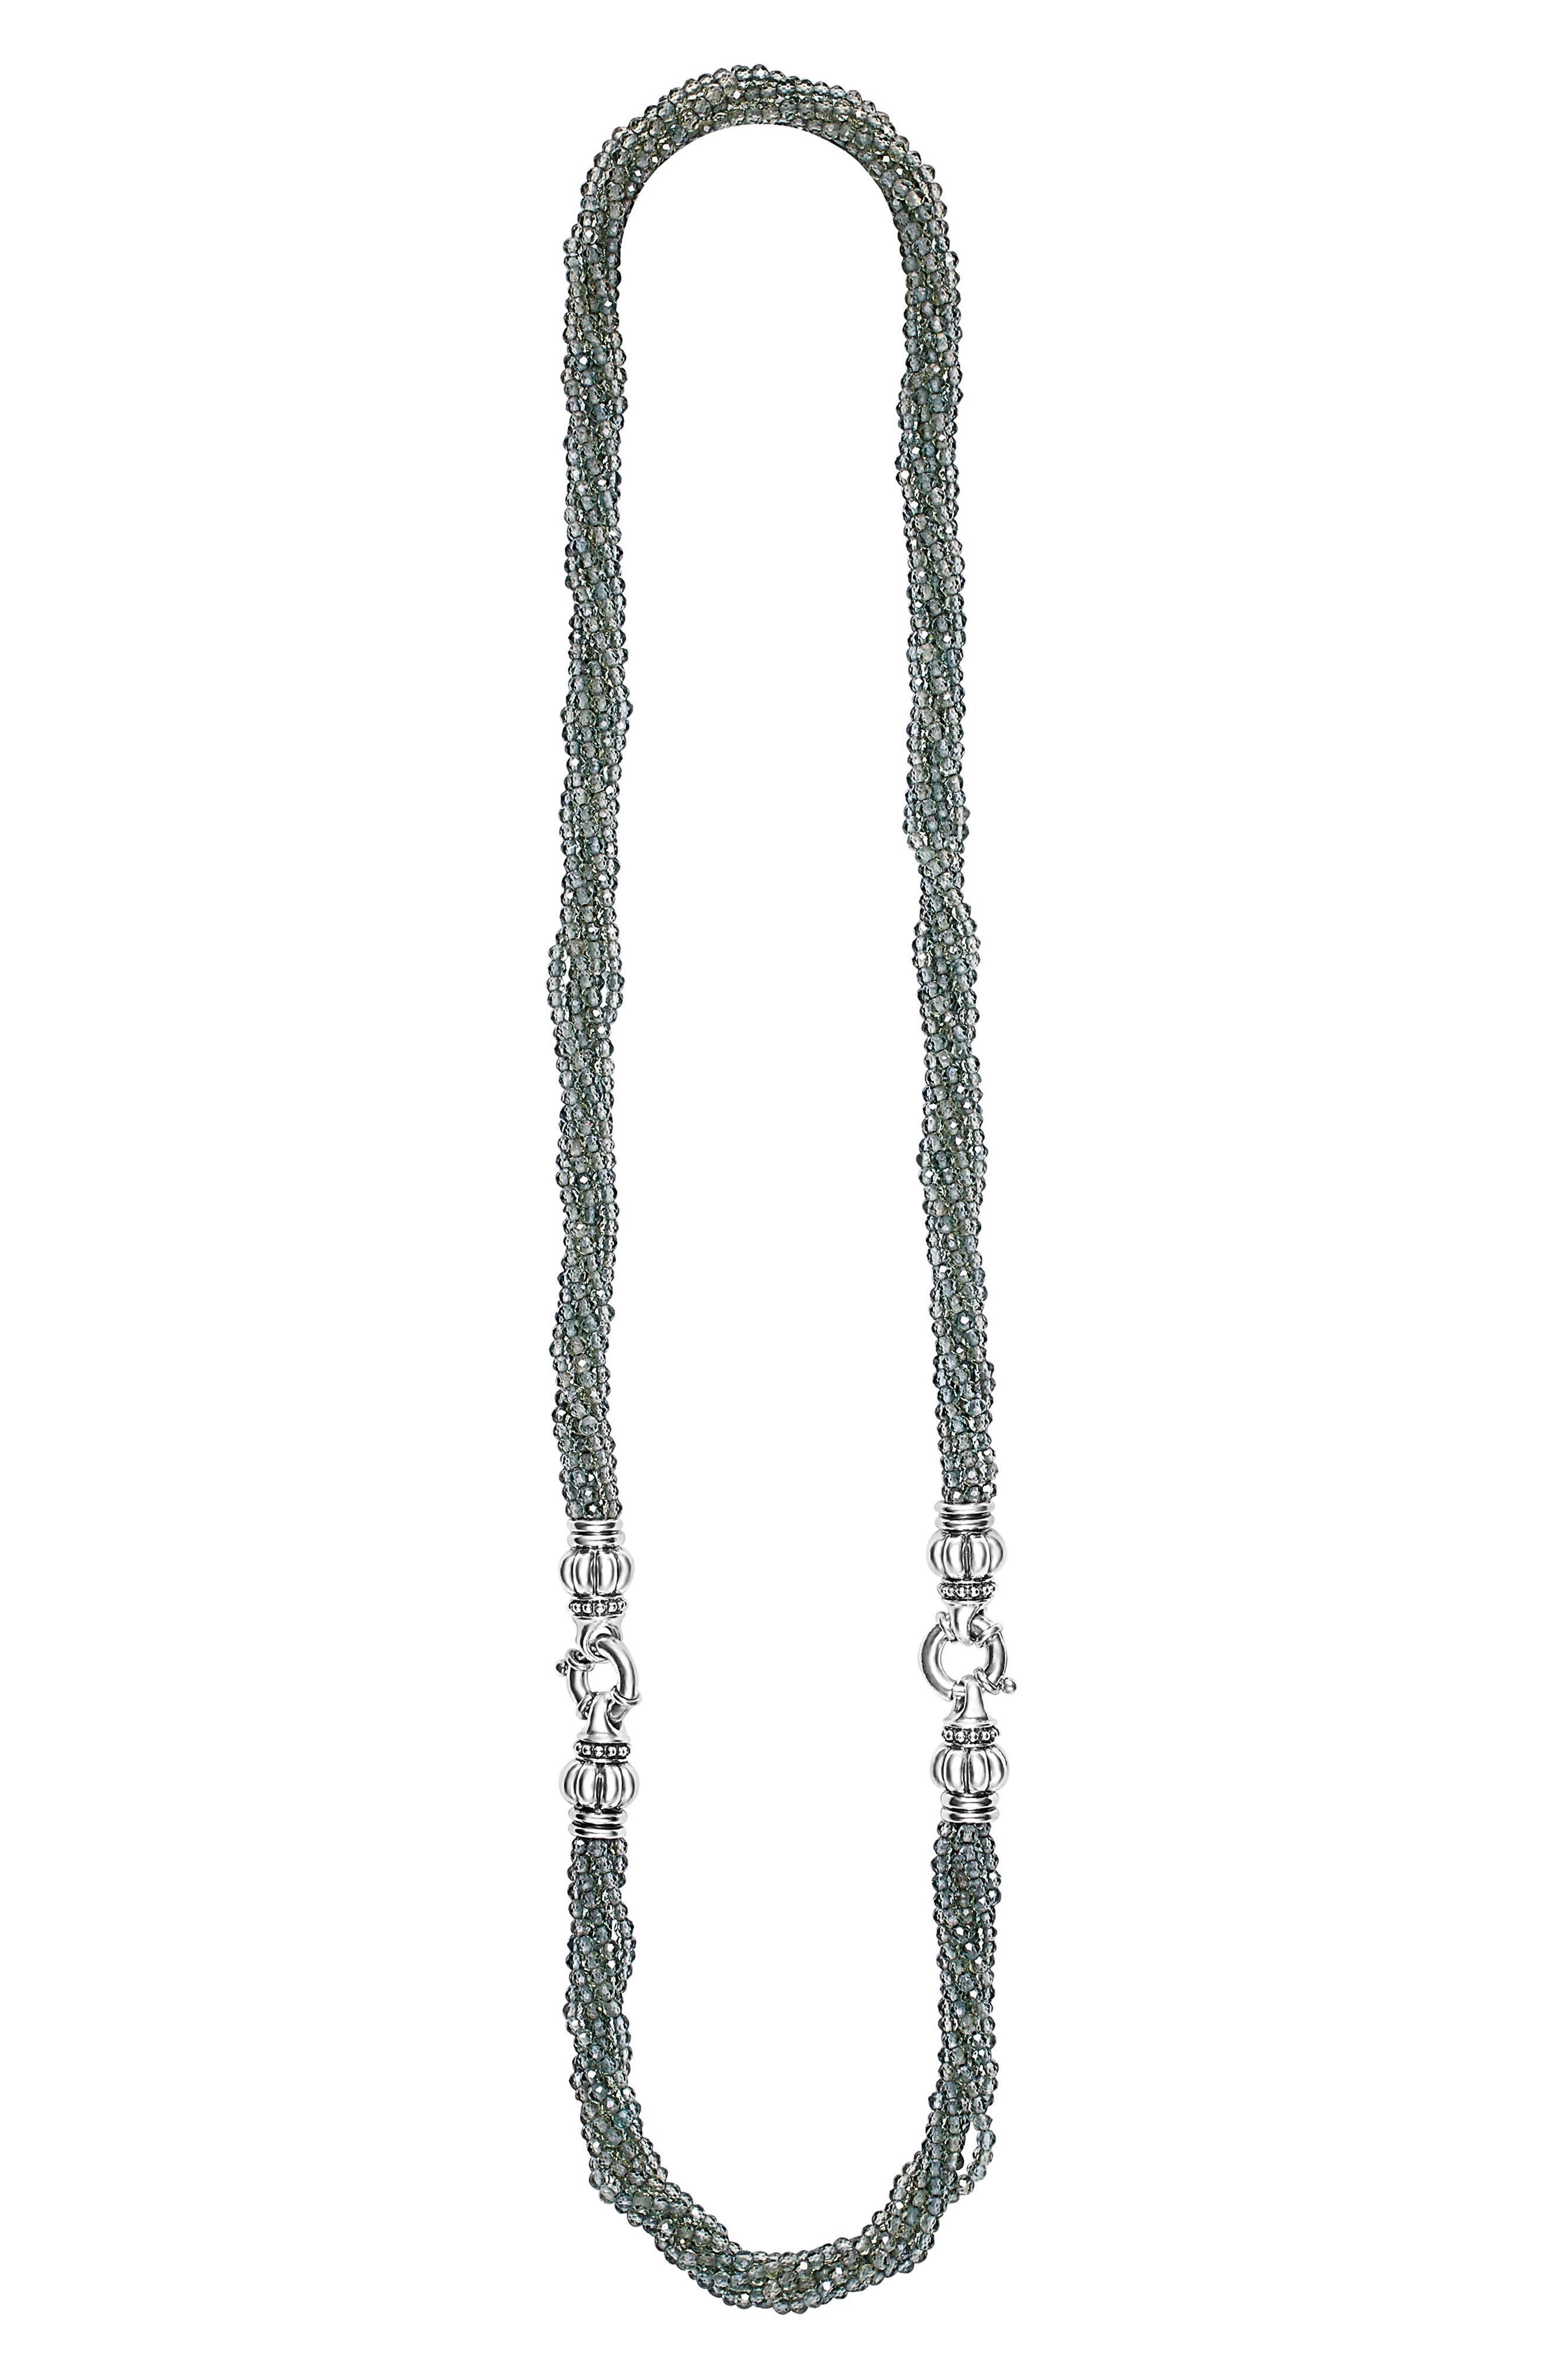 Caviar Icon Bead Convertible Bracelet & Necklace,                             Alternate thumbnail 2, color,                             040